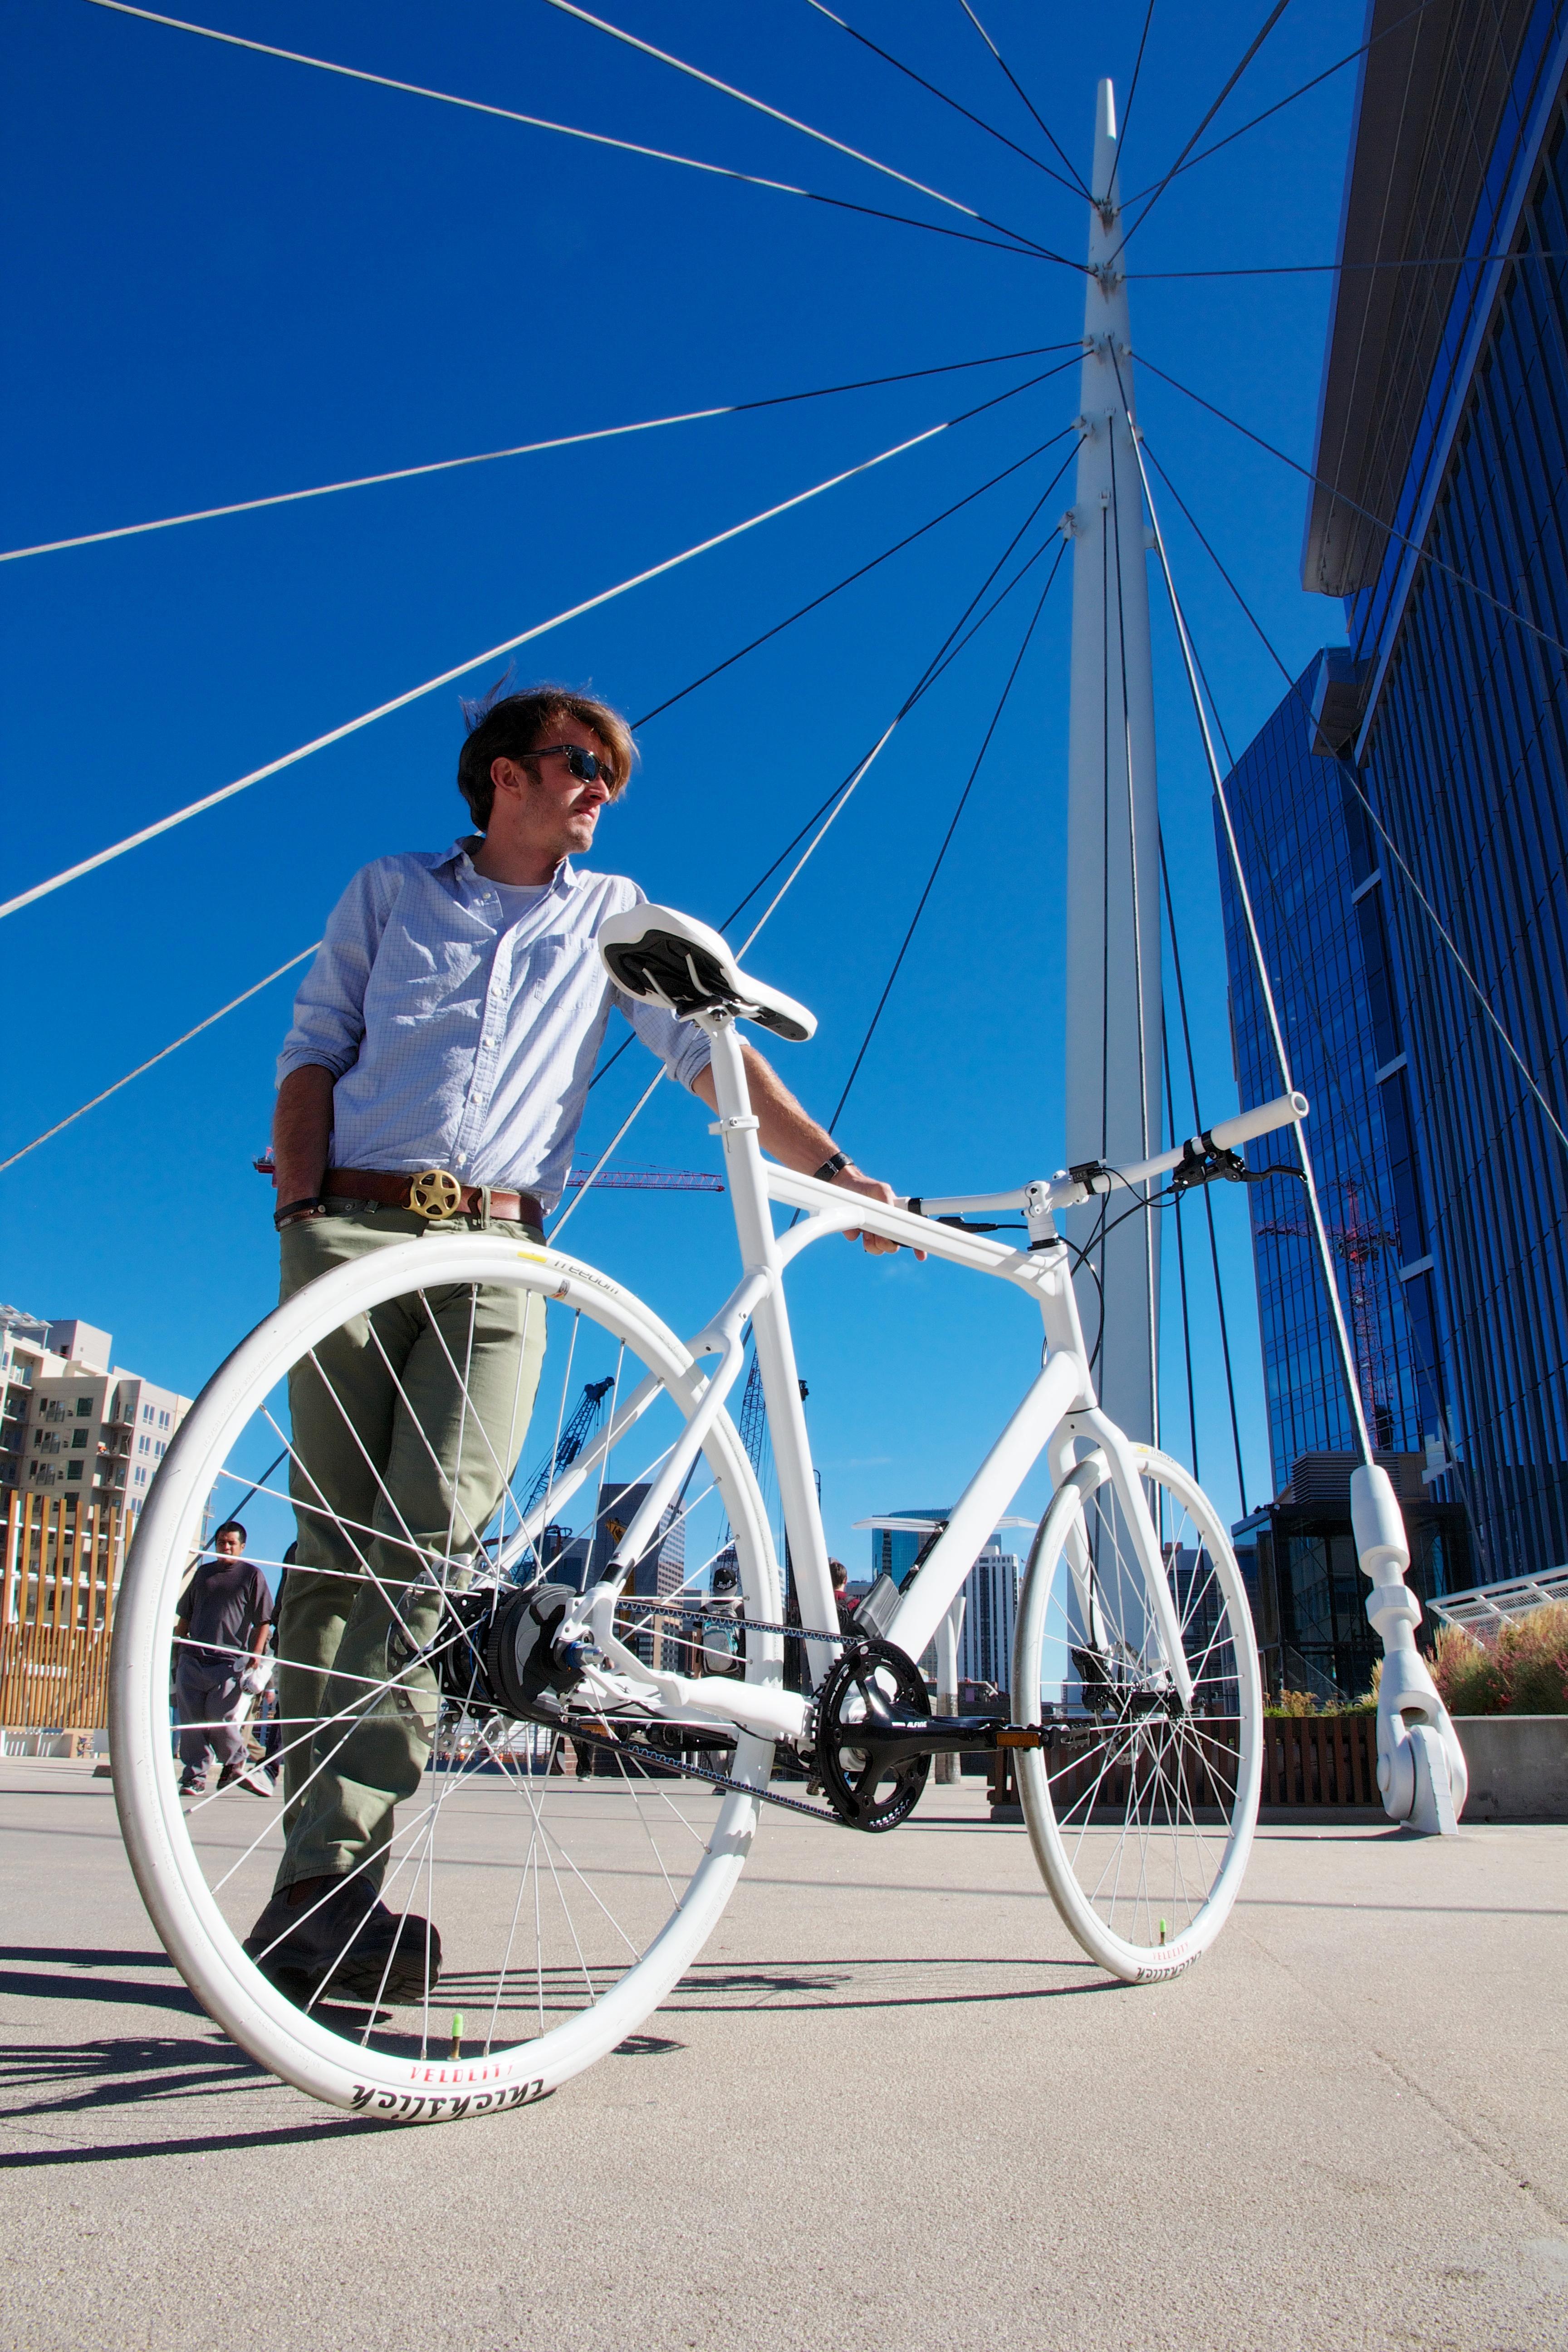 Alfine Di2 Carbon Drive bike in plaza